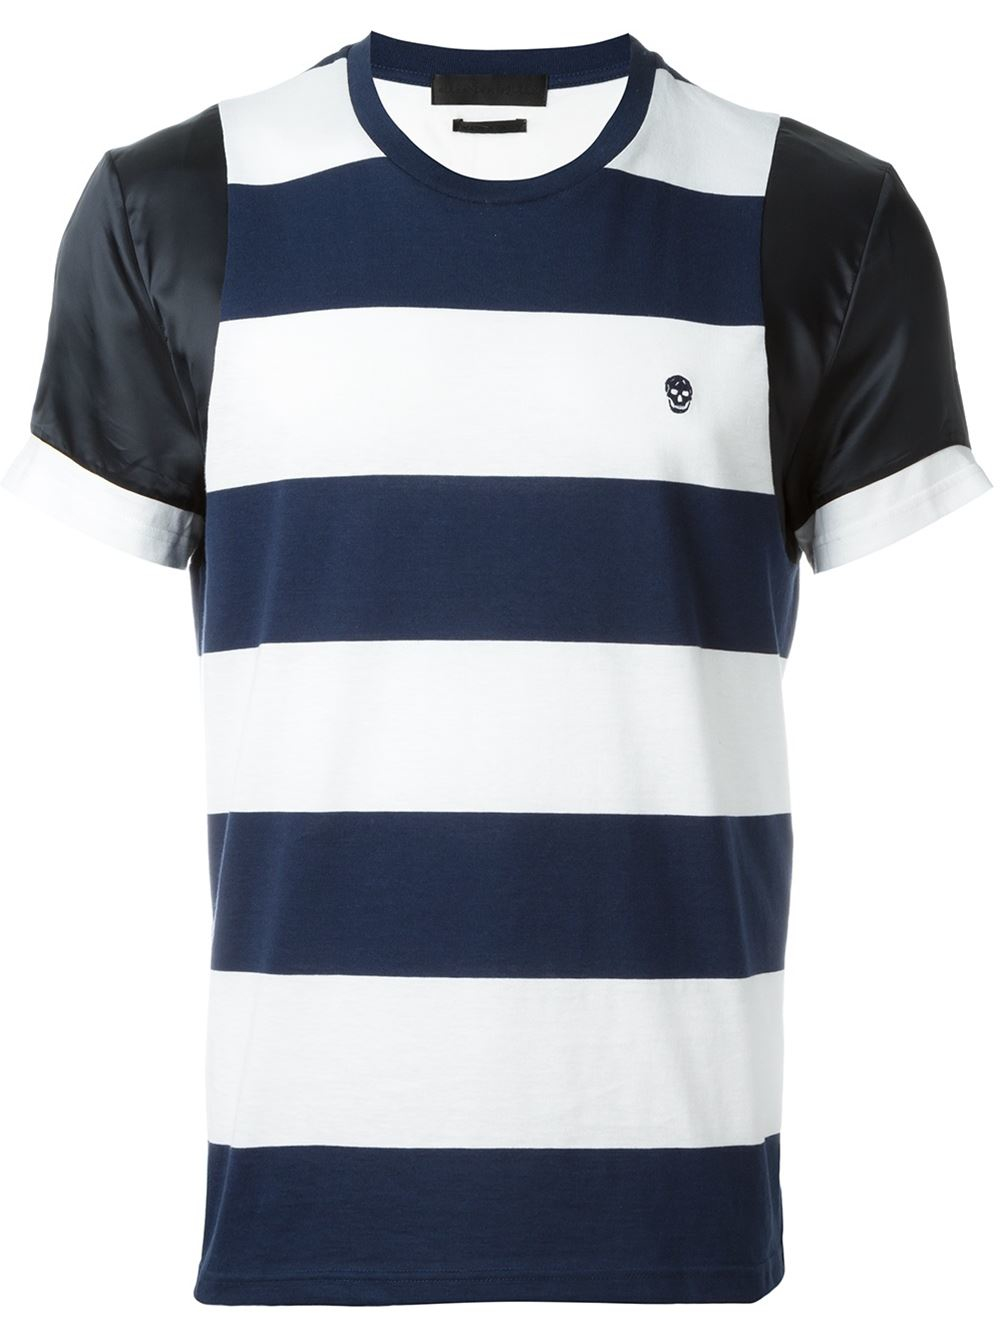 Lyst alexander mcqueen striped t shirt in blue for men for Alexander mcqueen shirt men